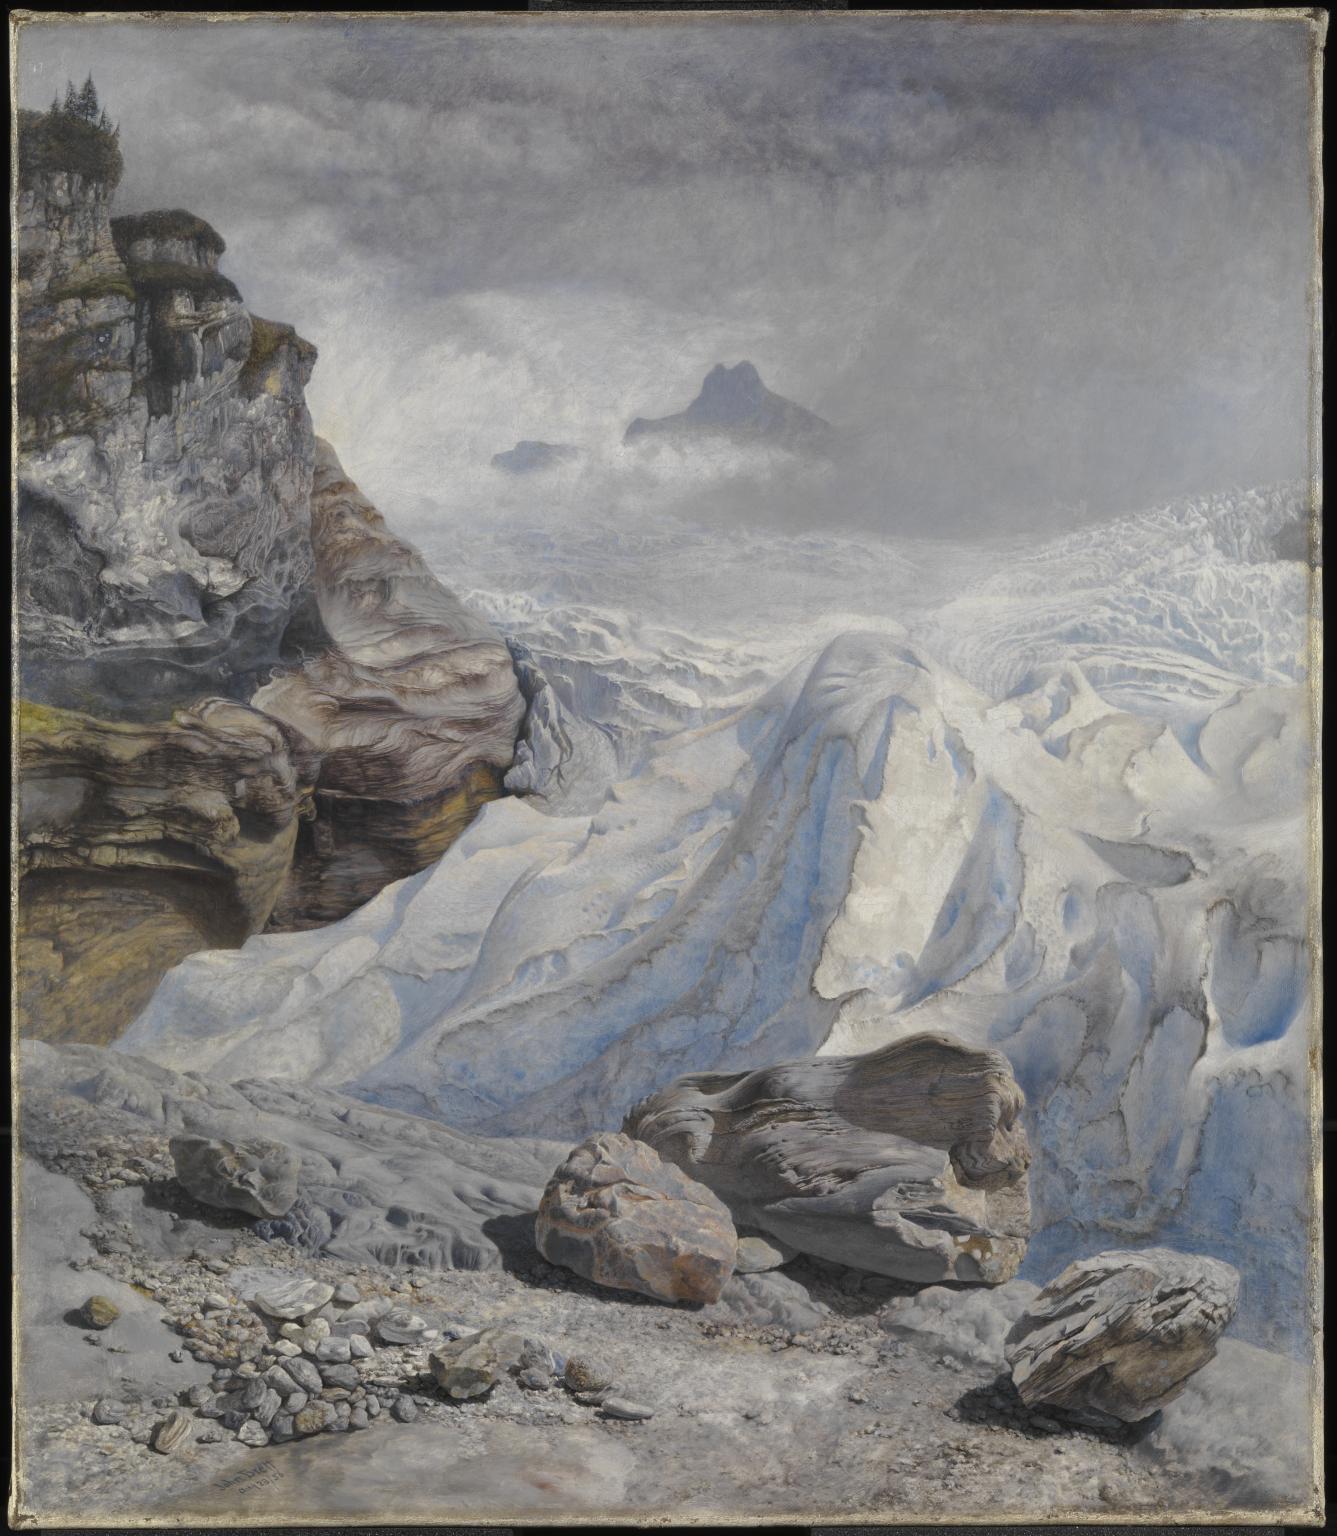 John Brett, Il ghiacciaio di Rosenlaui (1856; olio su tela, 44,5 x 41,9 cm; Londra, Tate Britain)